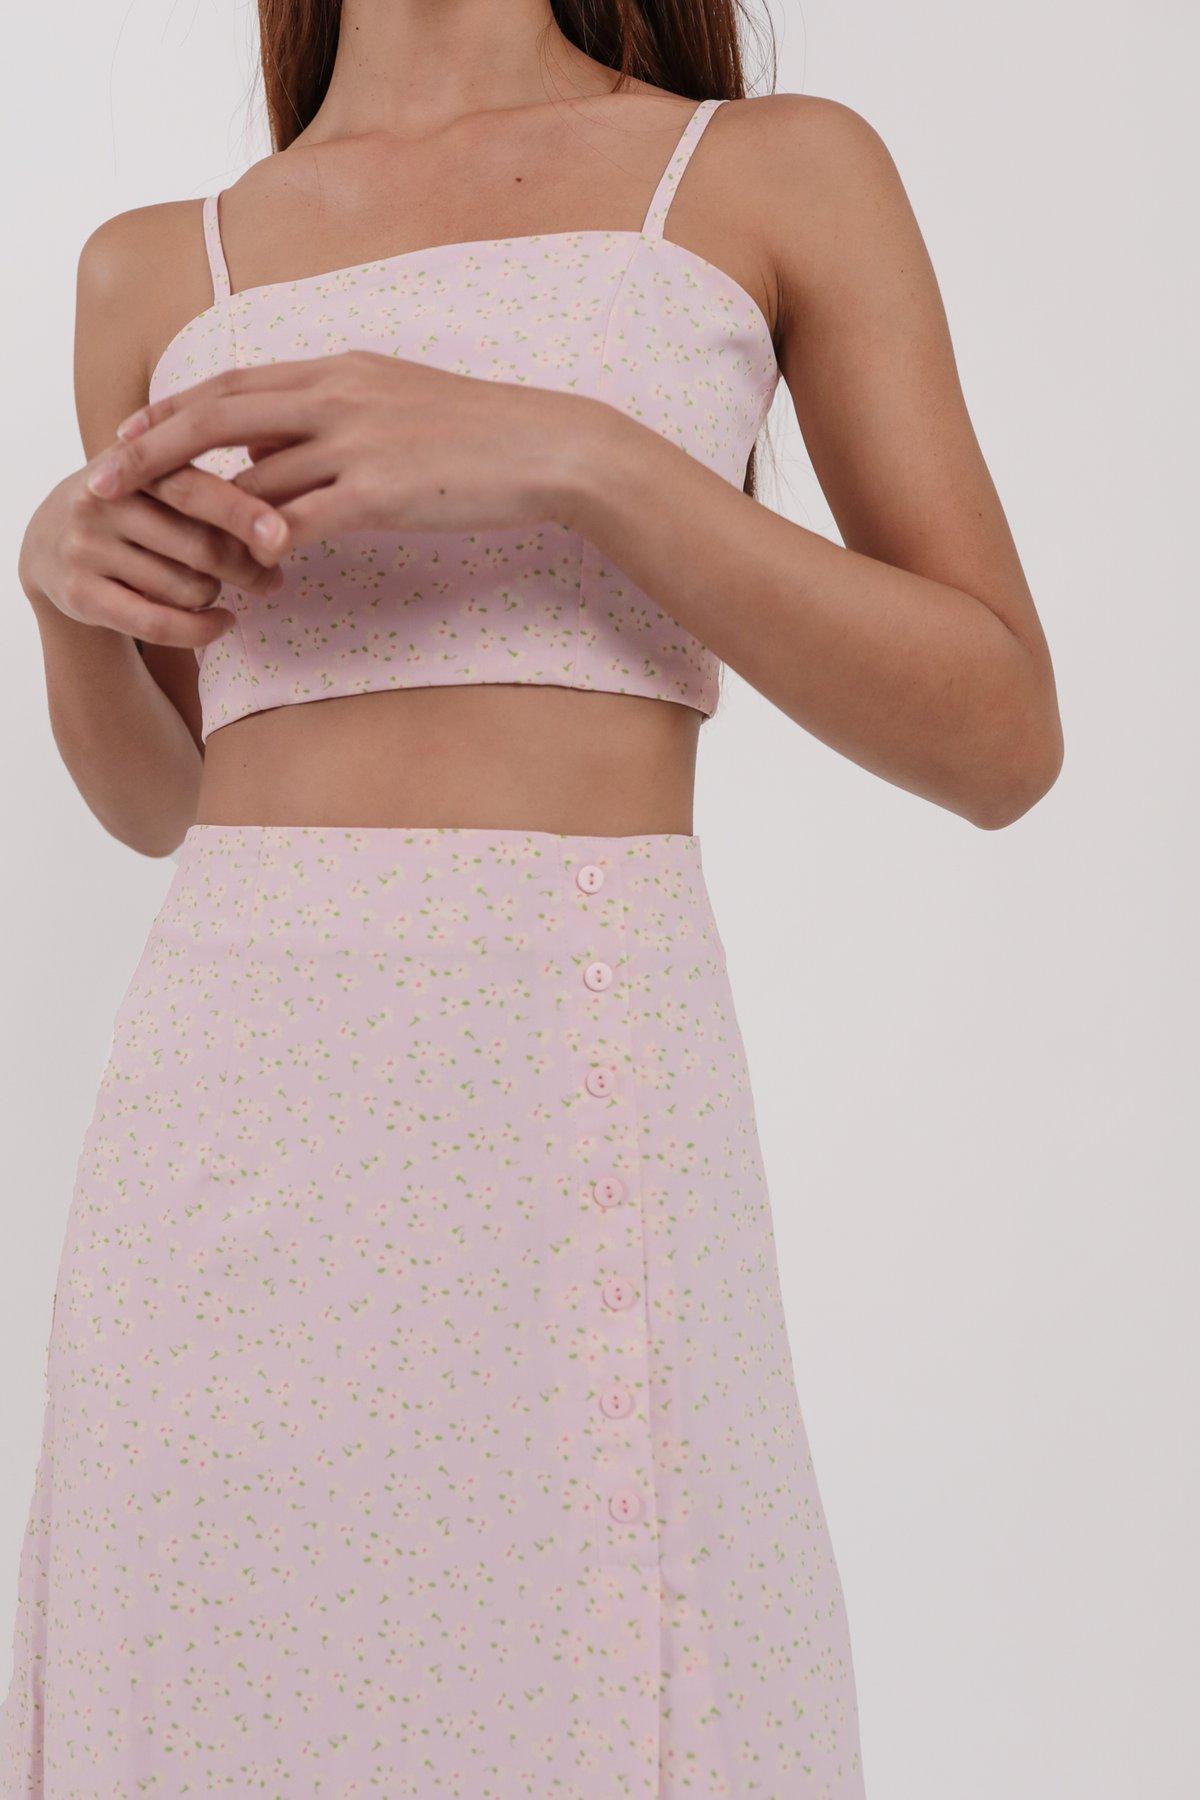 Margo Midi Skirt (Pink Daisy)